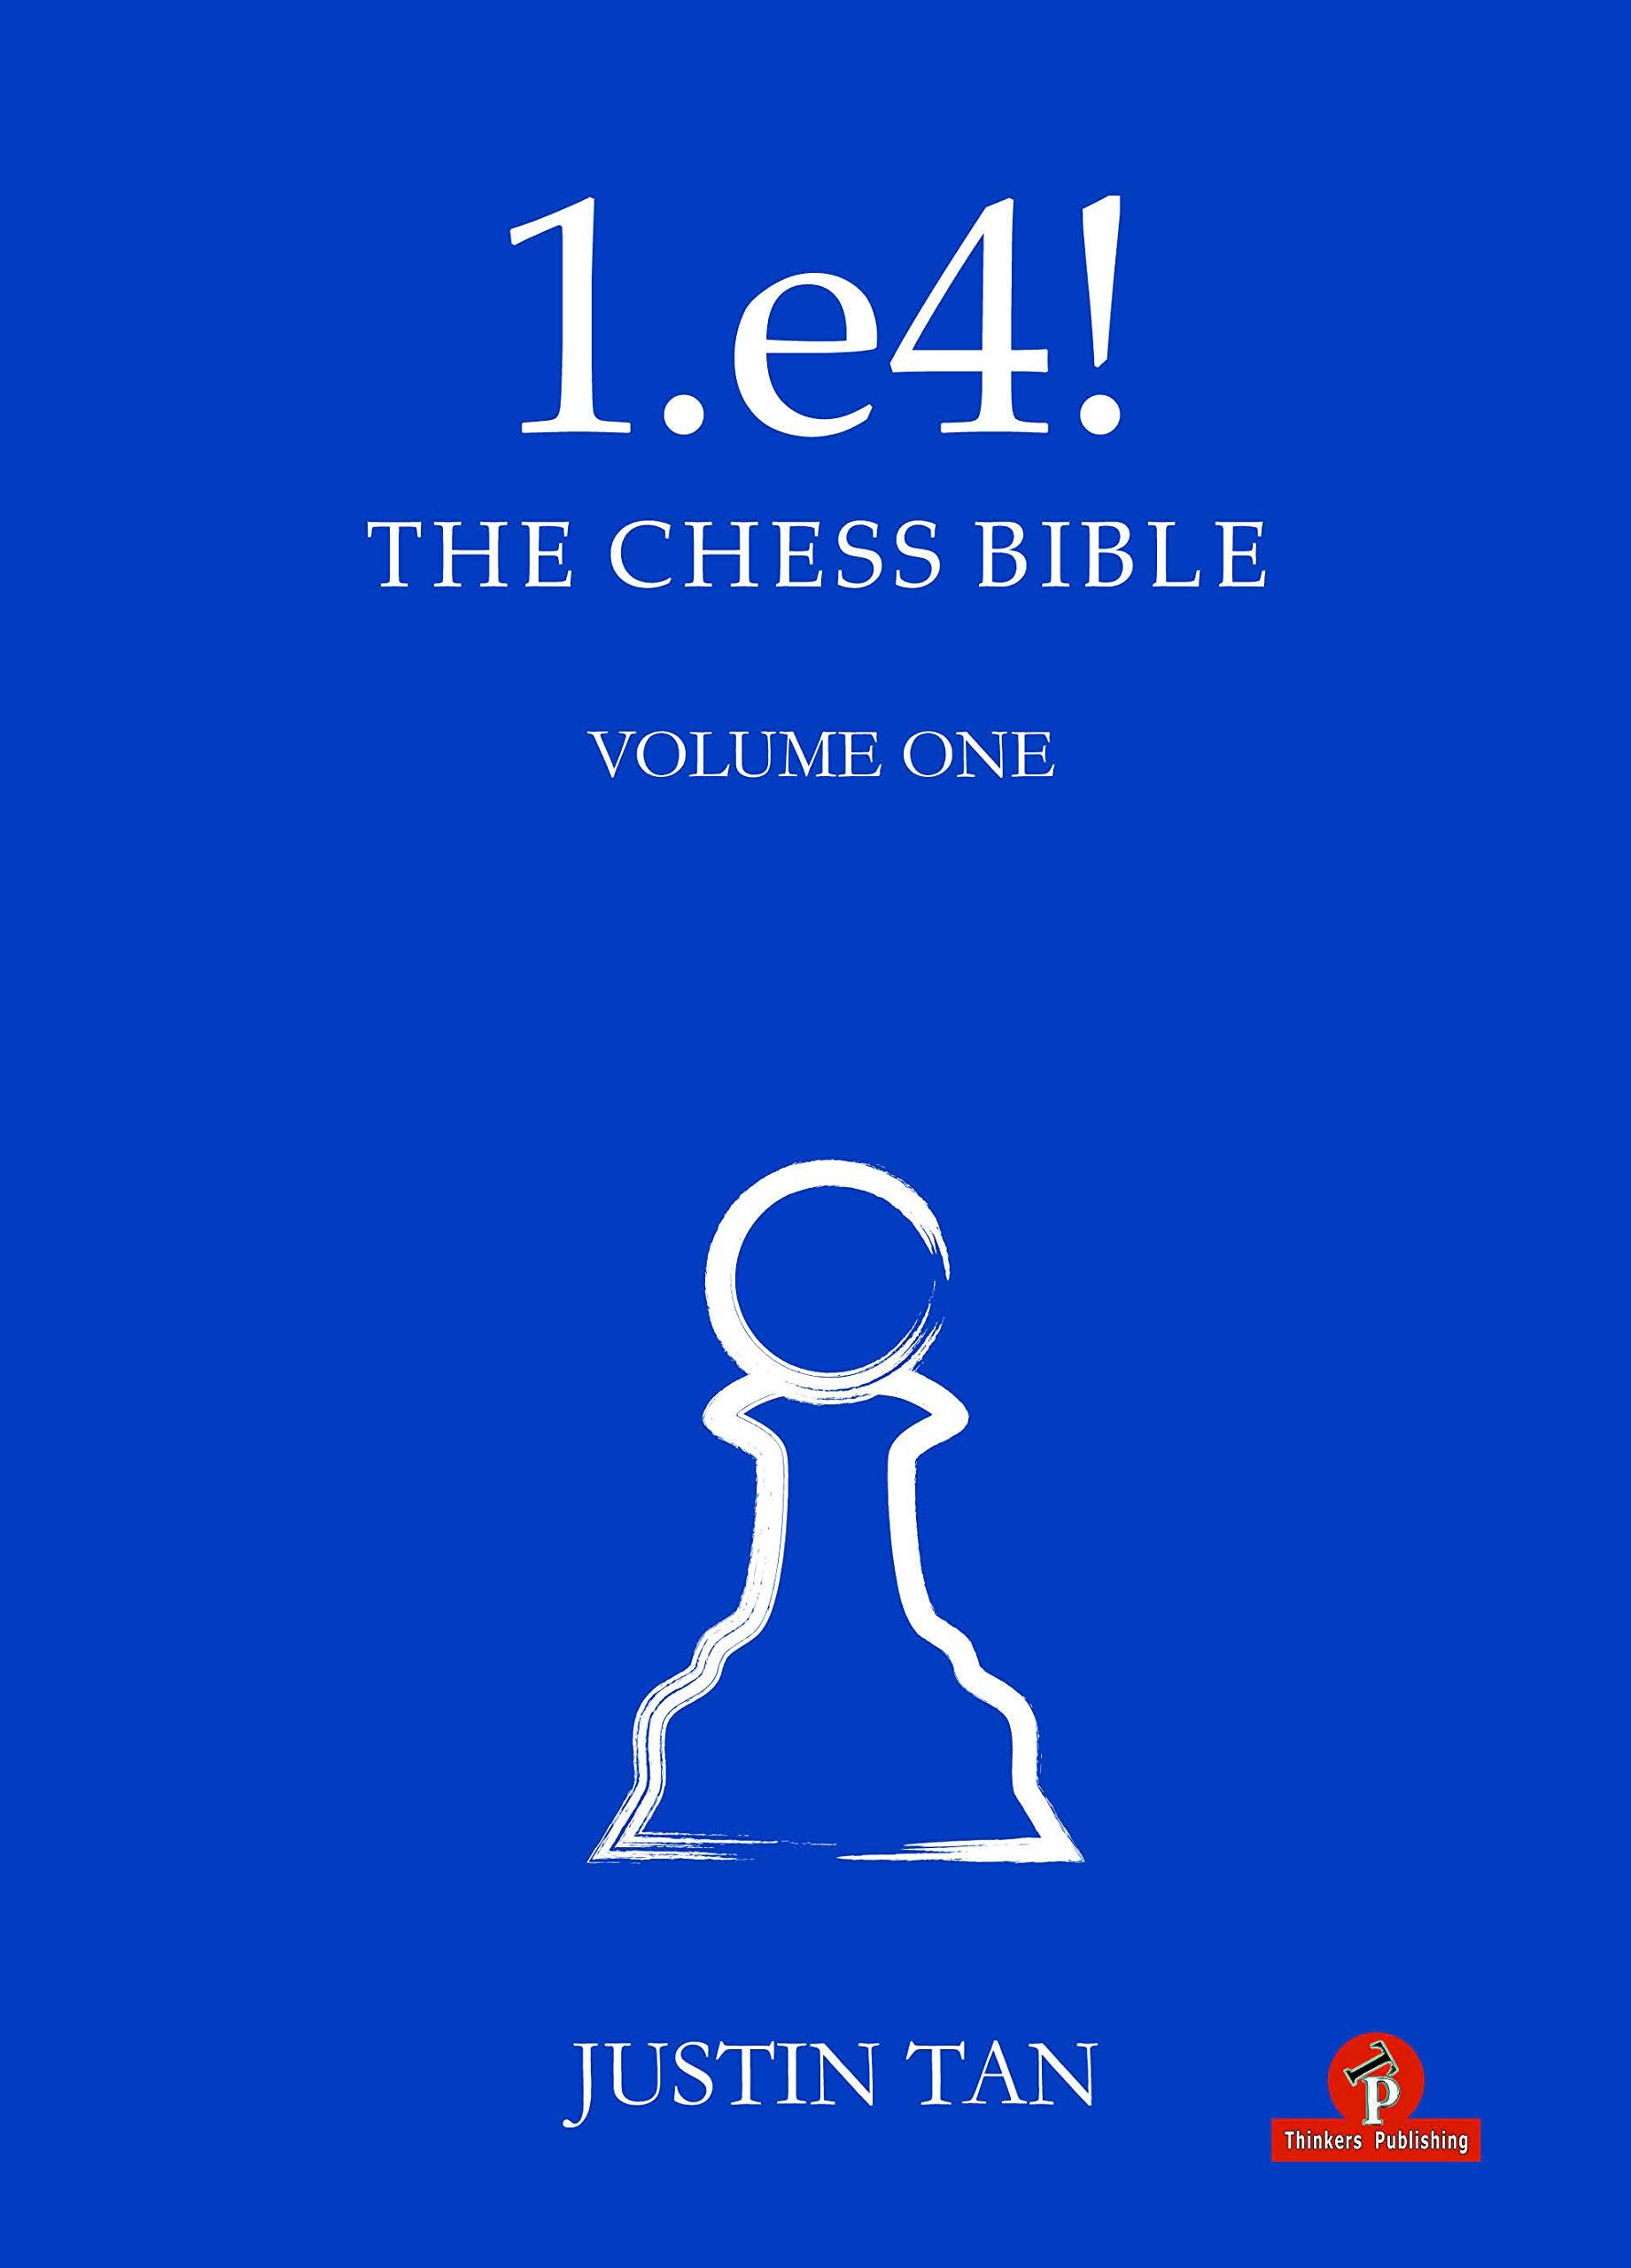 1.e4! The Chess Bible: The Chess Bible - Volume 1, Justin Tam, Thinker's Publishing, 13th April 2021, ISBN-13  :  978-9464201123